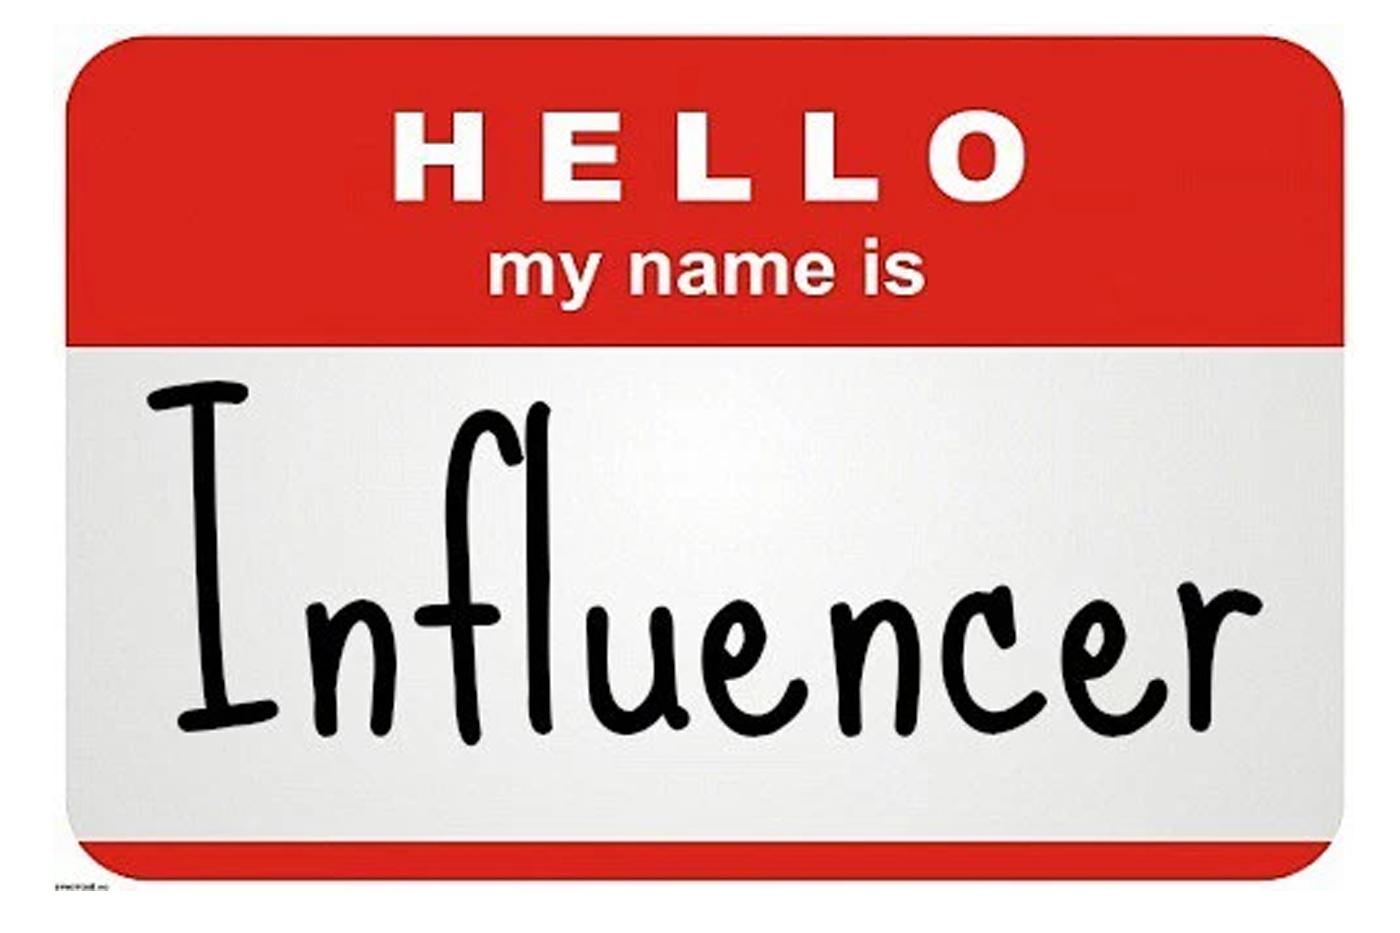 influencer, publicidad, mercadeo, marketing, neuro media, neuromedia, informacion, noticias, blog, innovacion, agencia, agencia digital, cali